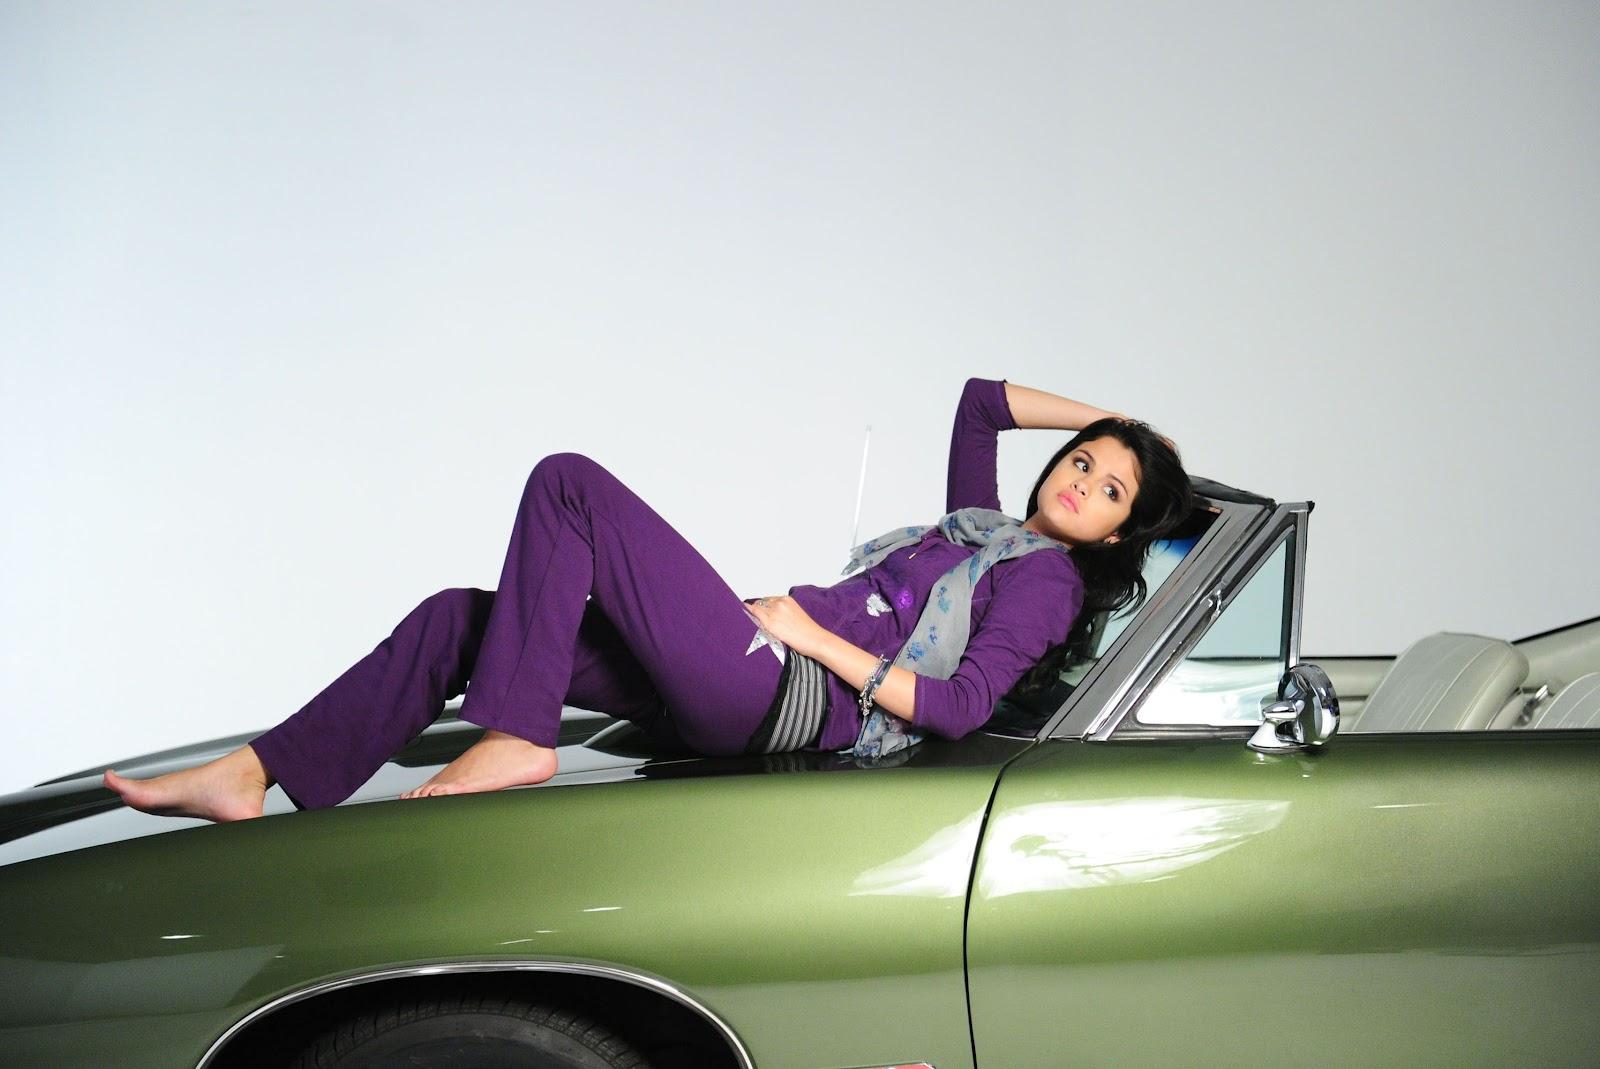 Discussion on this topic: Selena Gomez Dream Out Loud FallWinter 2012-2013 , selena-gomez-dream-out-loud-fallwinter-2012-2013/